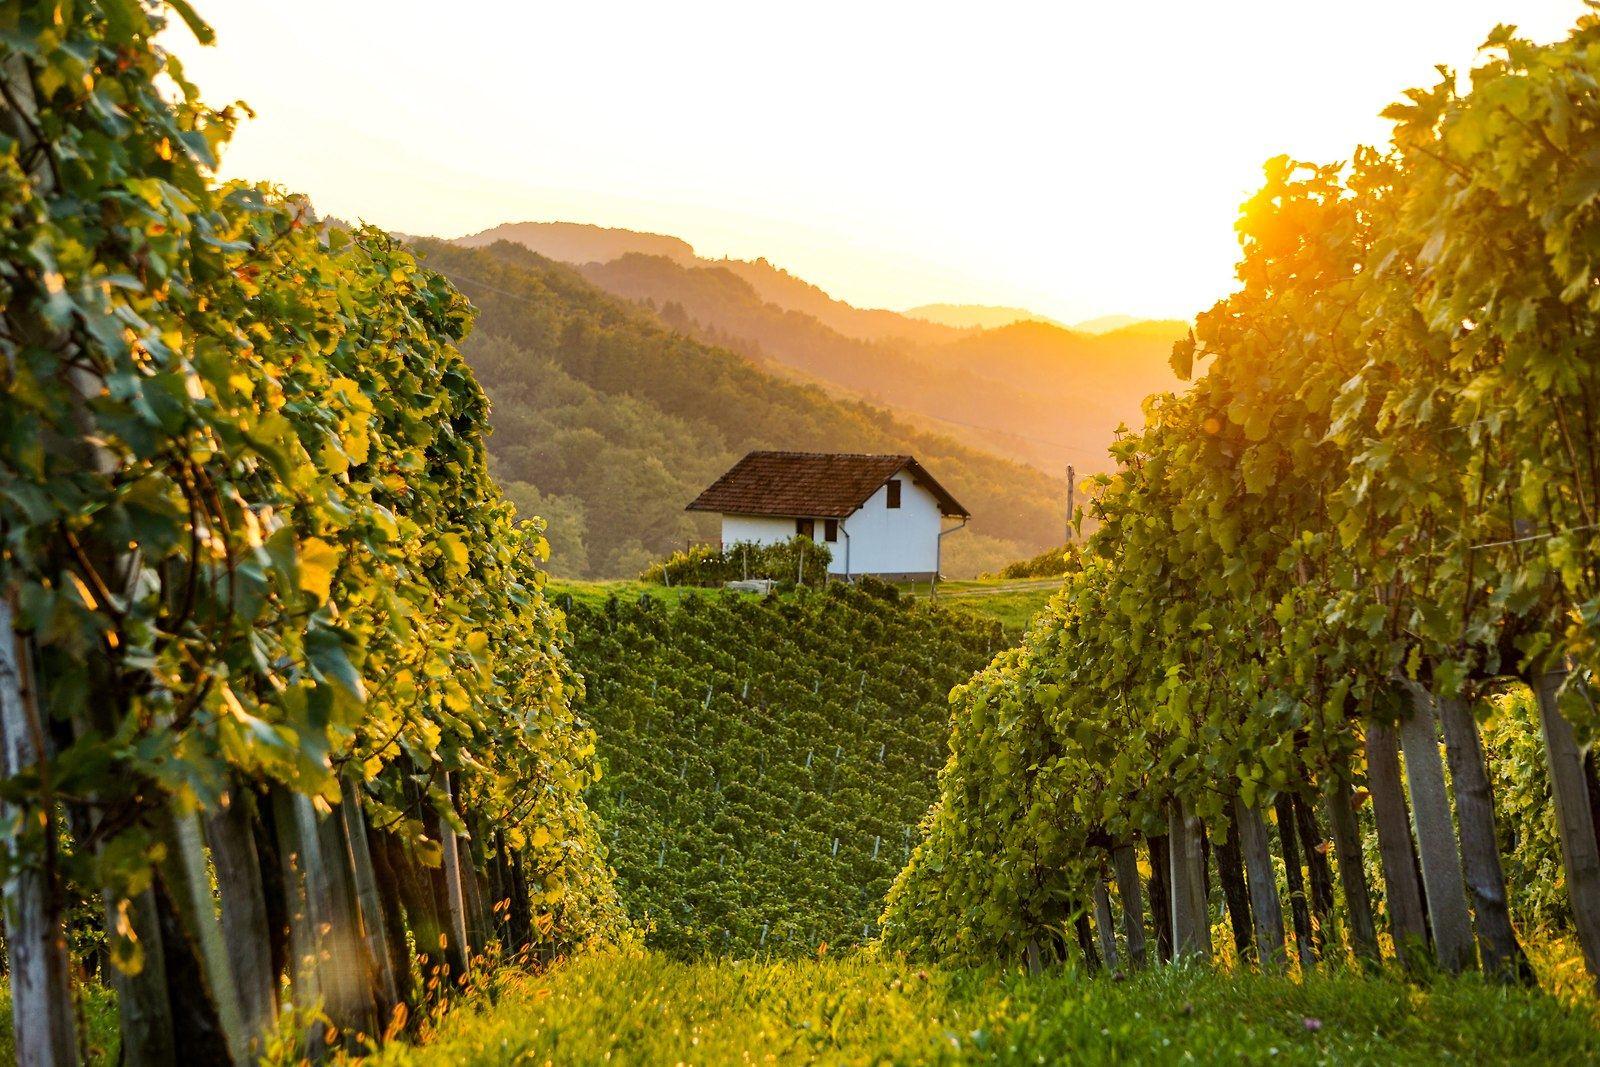 Vinohrad, Slovinsko. Foto: Slovenska turistična agecija